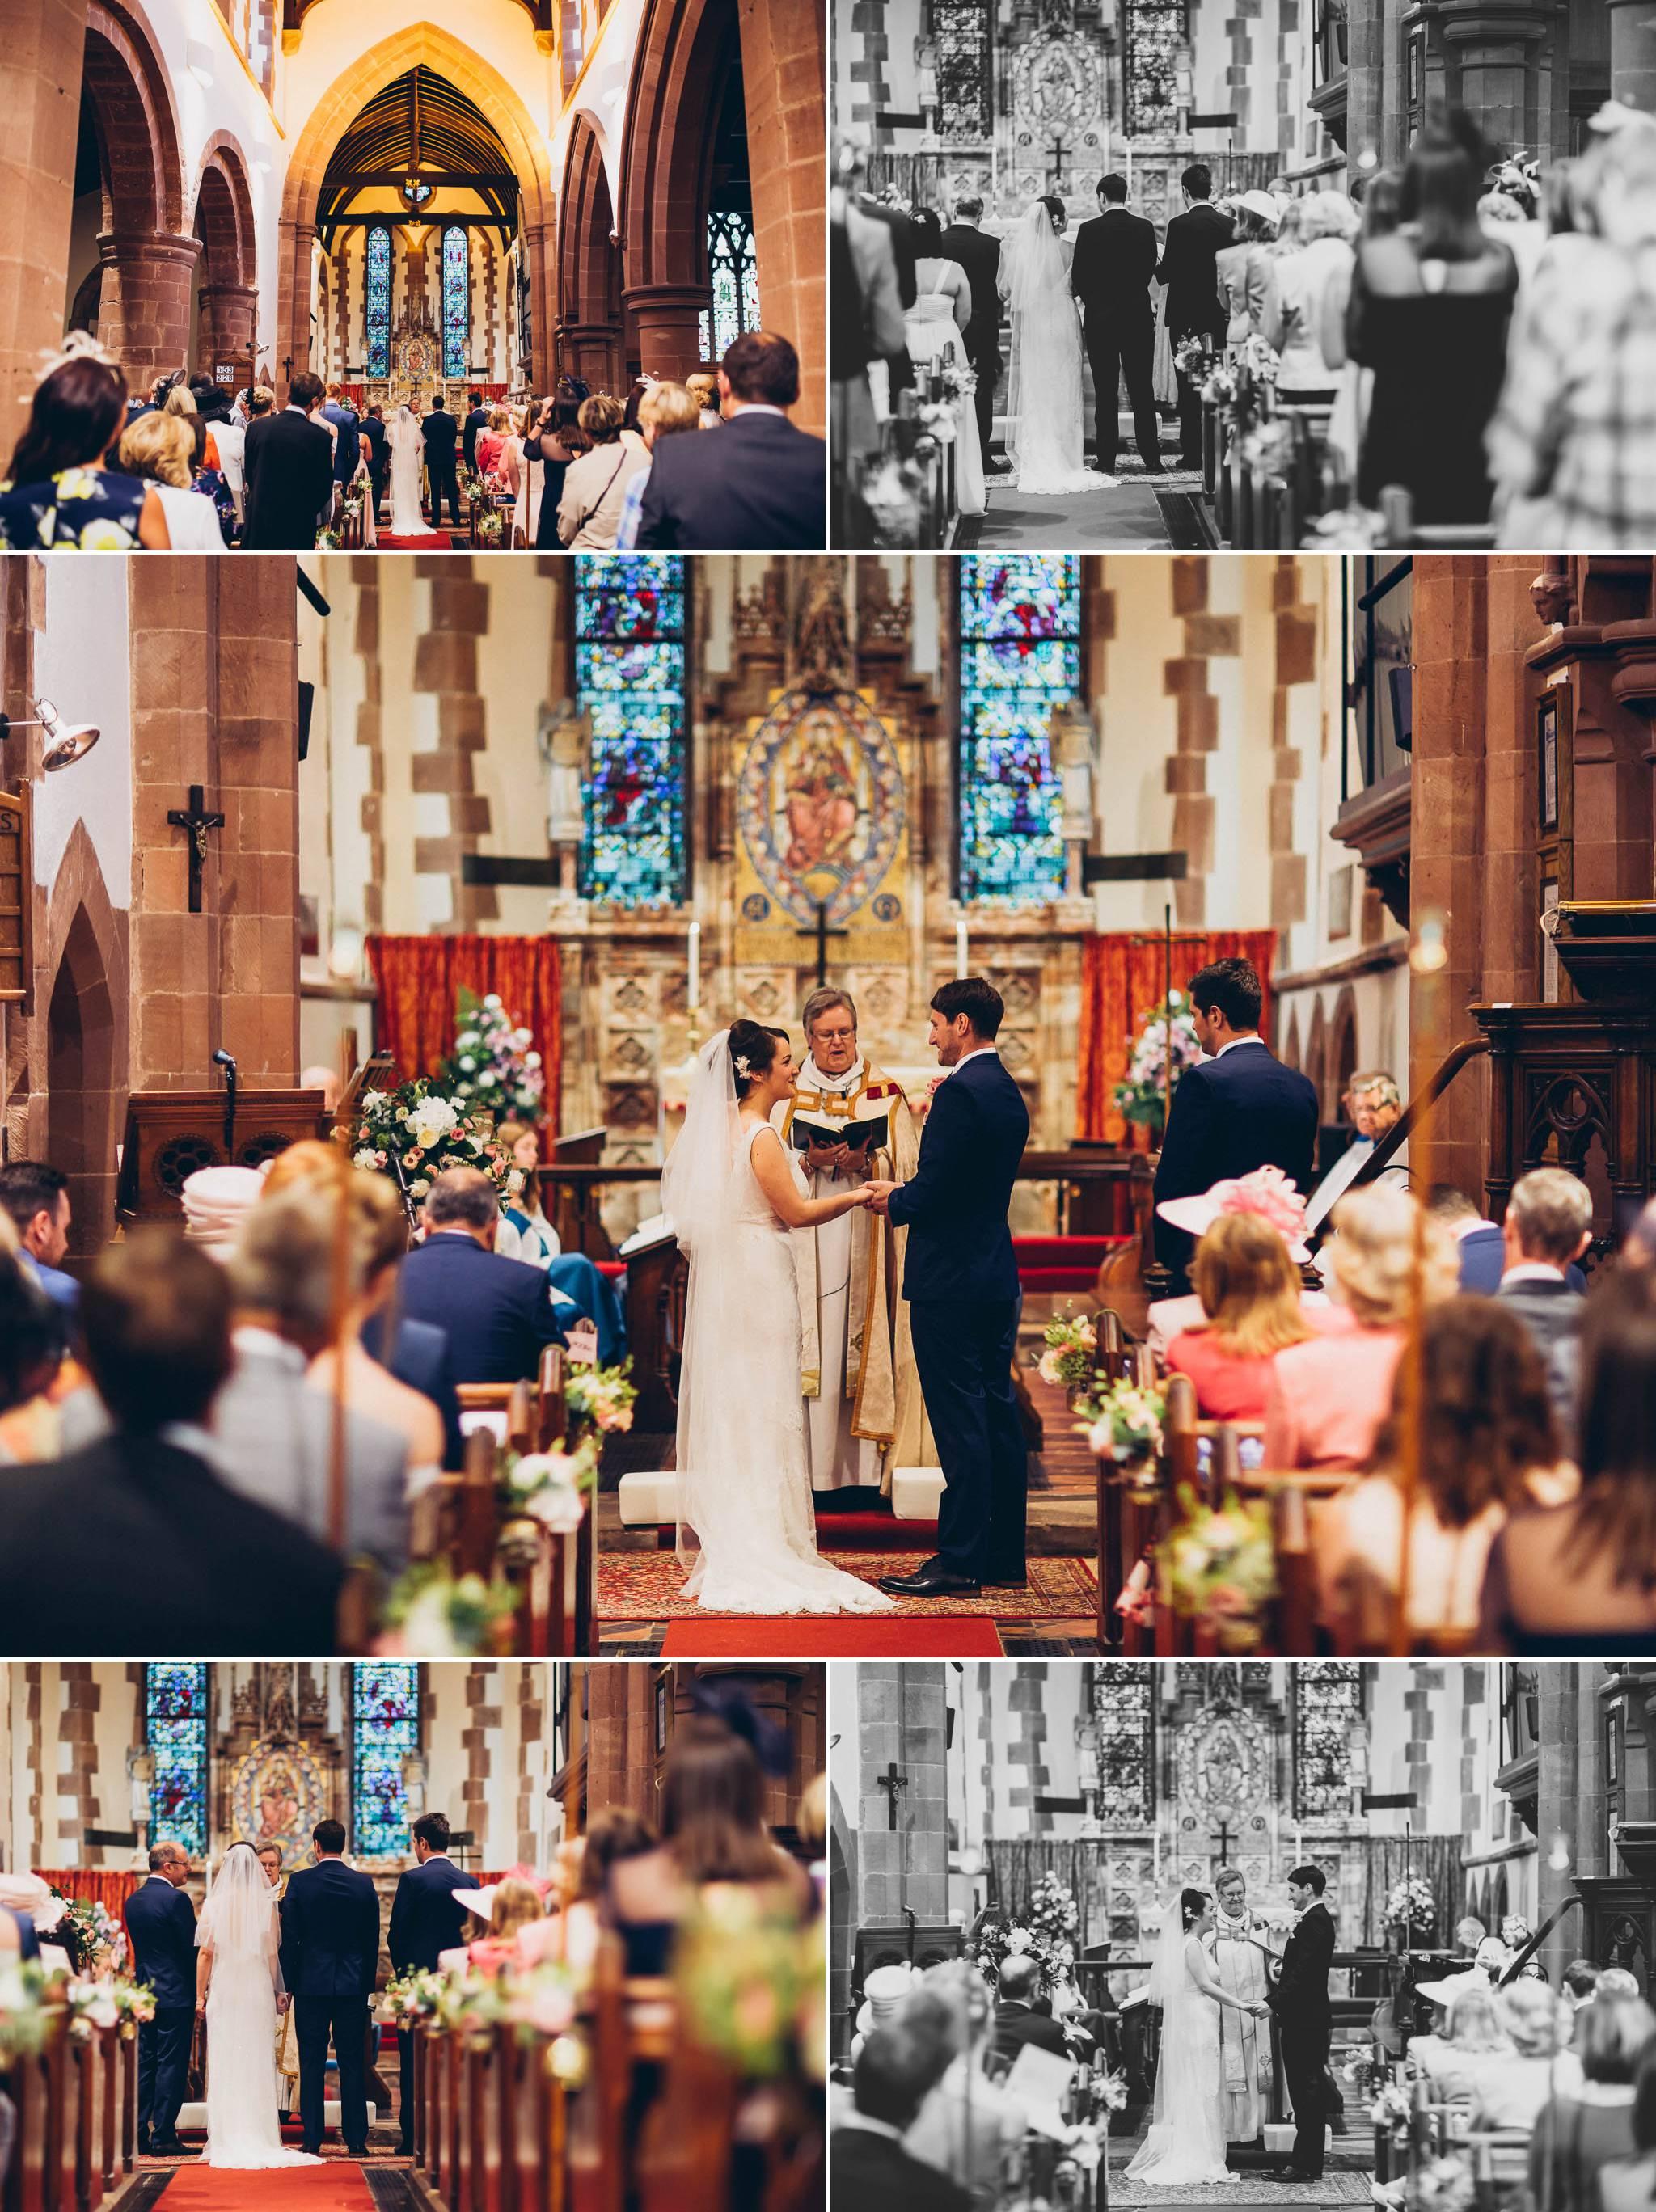 pendrell-hall-wedding-photography 6.jpg